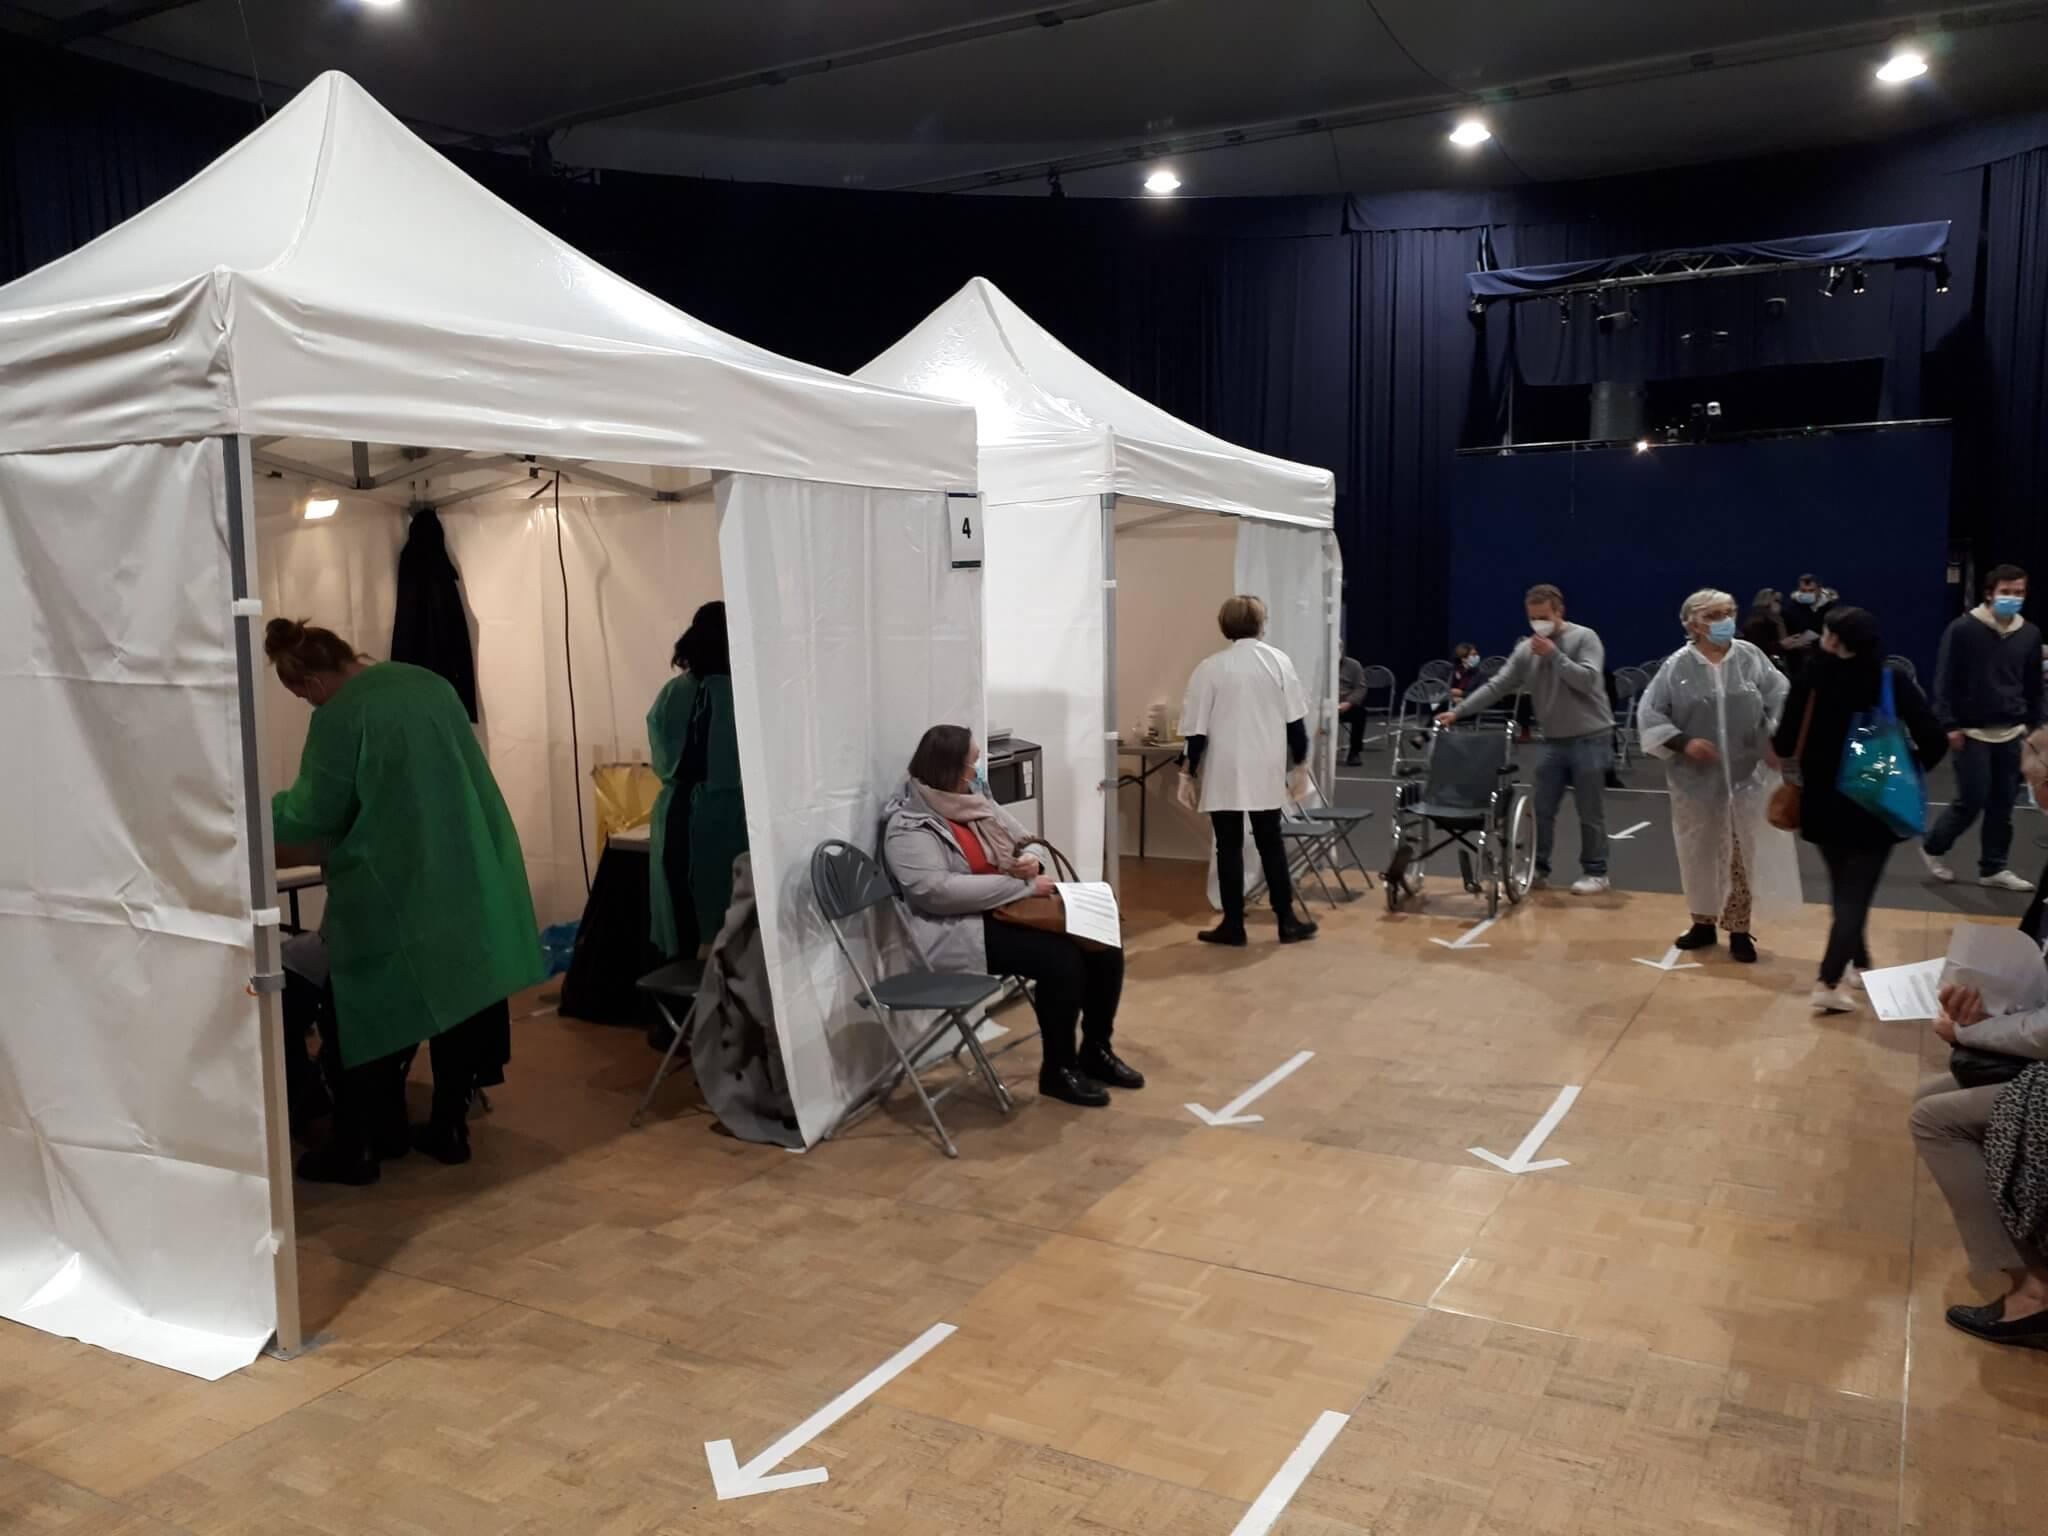 La vaccination prend de l'ampleur en Val-de-Marne